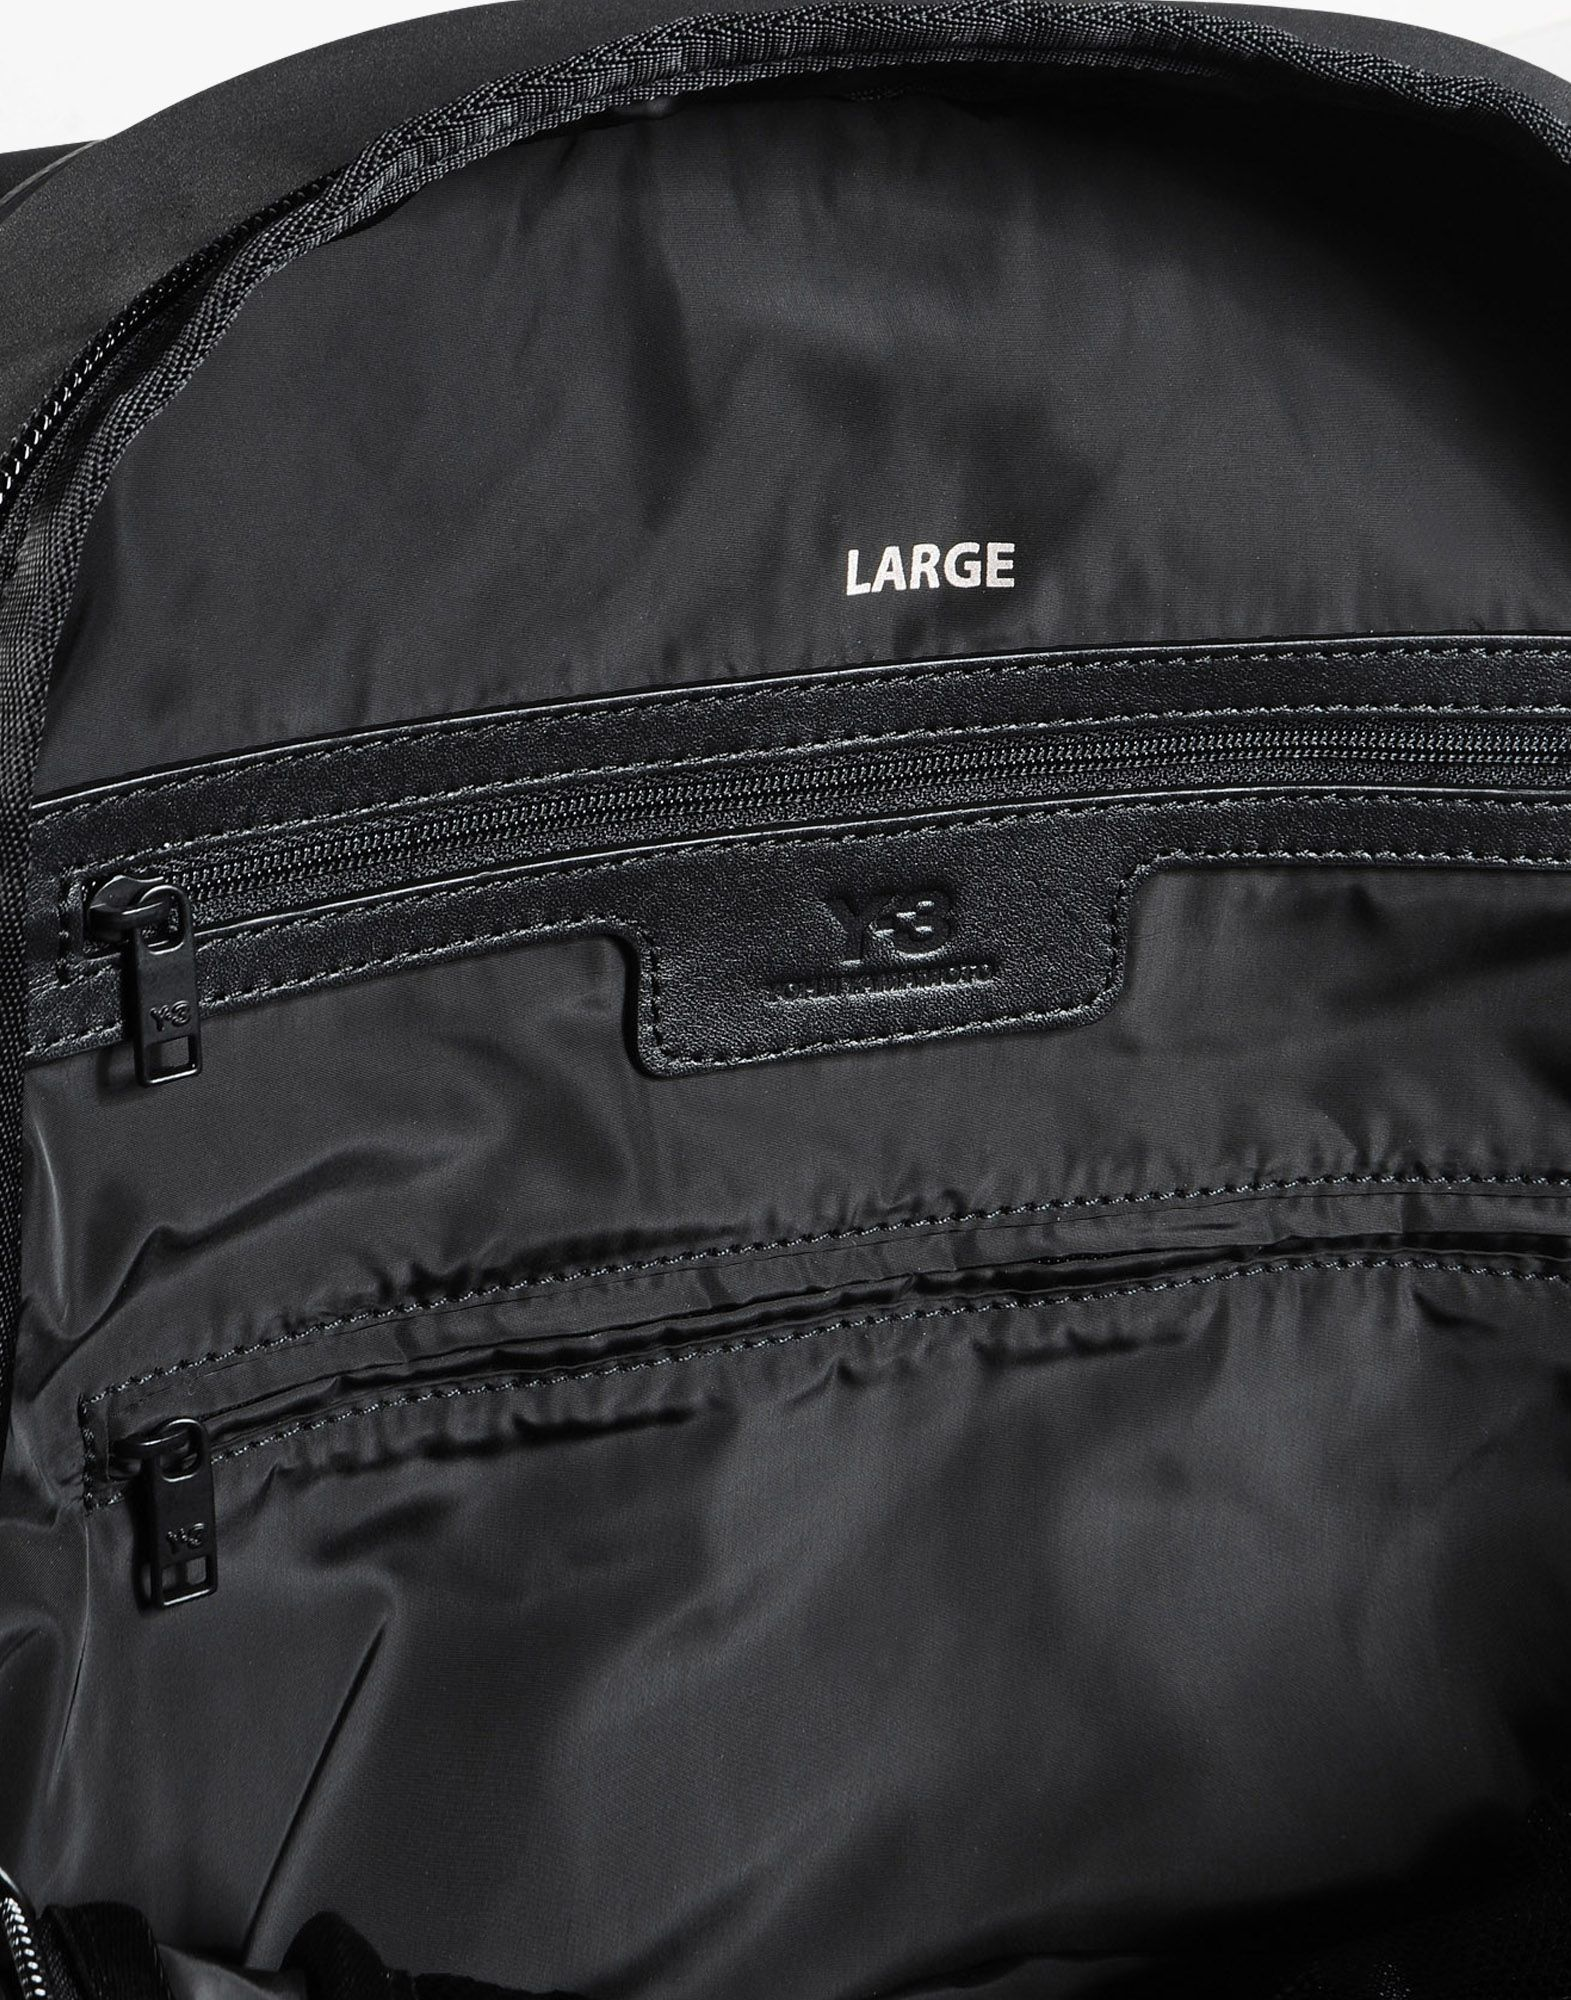 Y-3 VEST BACKPACK LARGE HANDBAGS unisex Y-3 adidas  HandbagsVintage ... bae857a7fb968